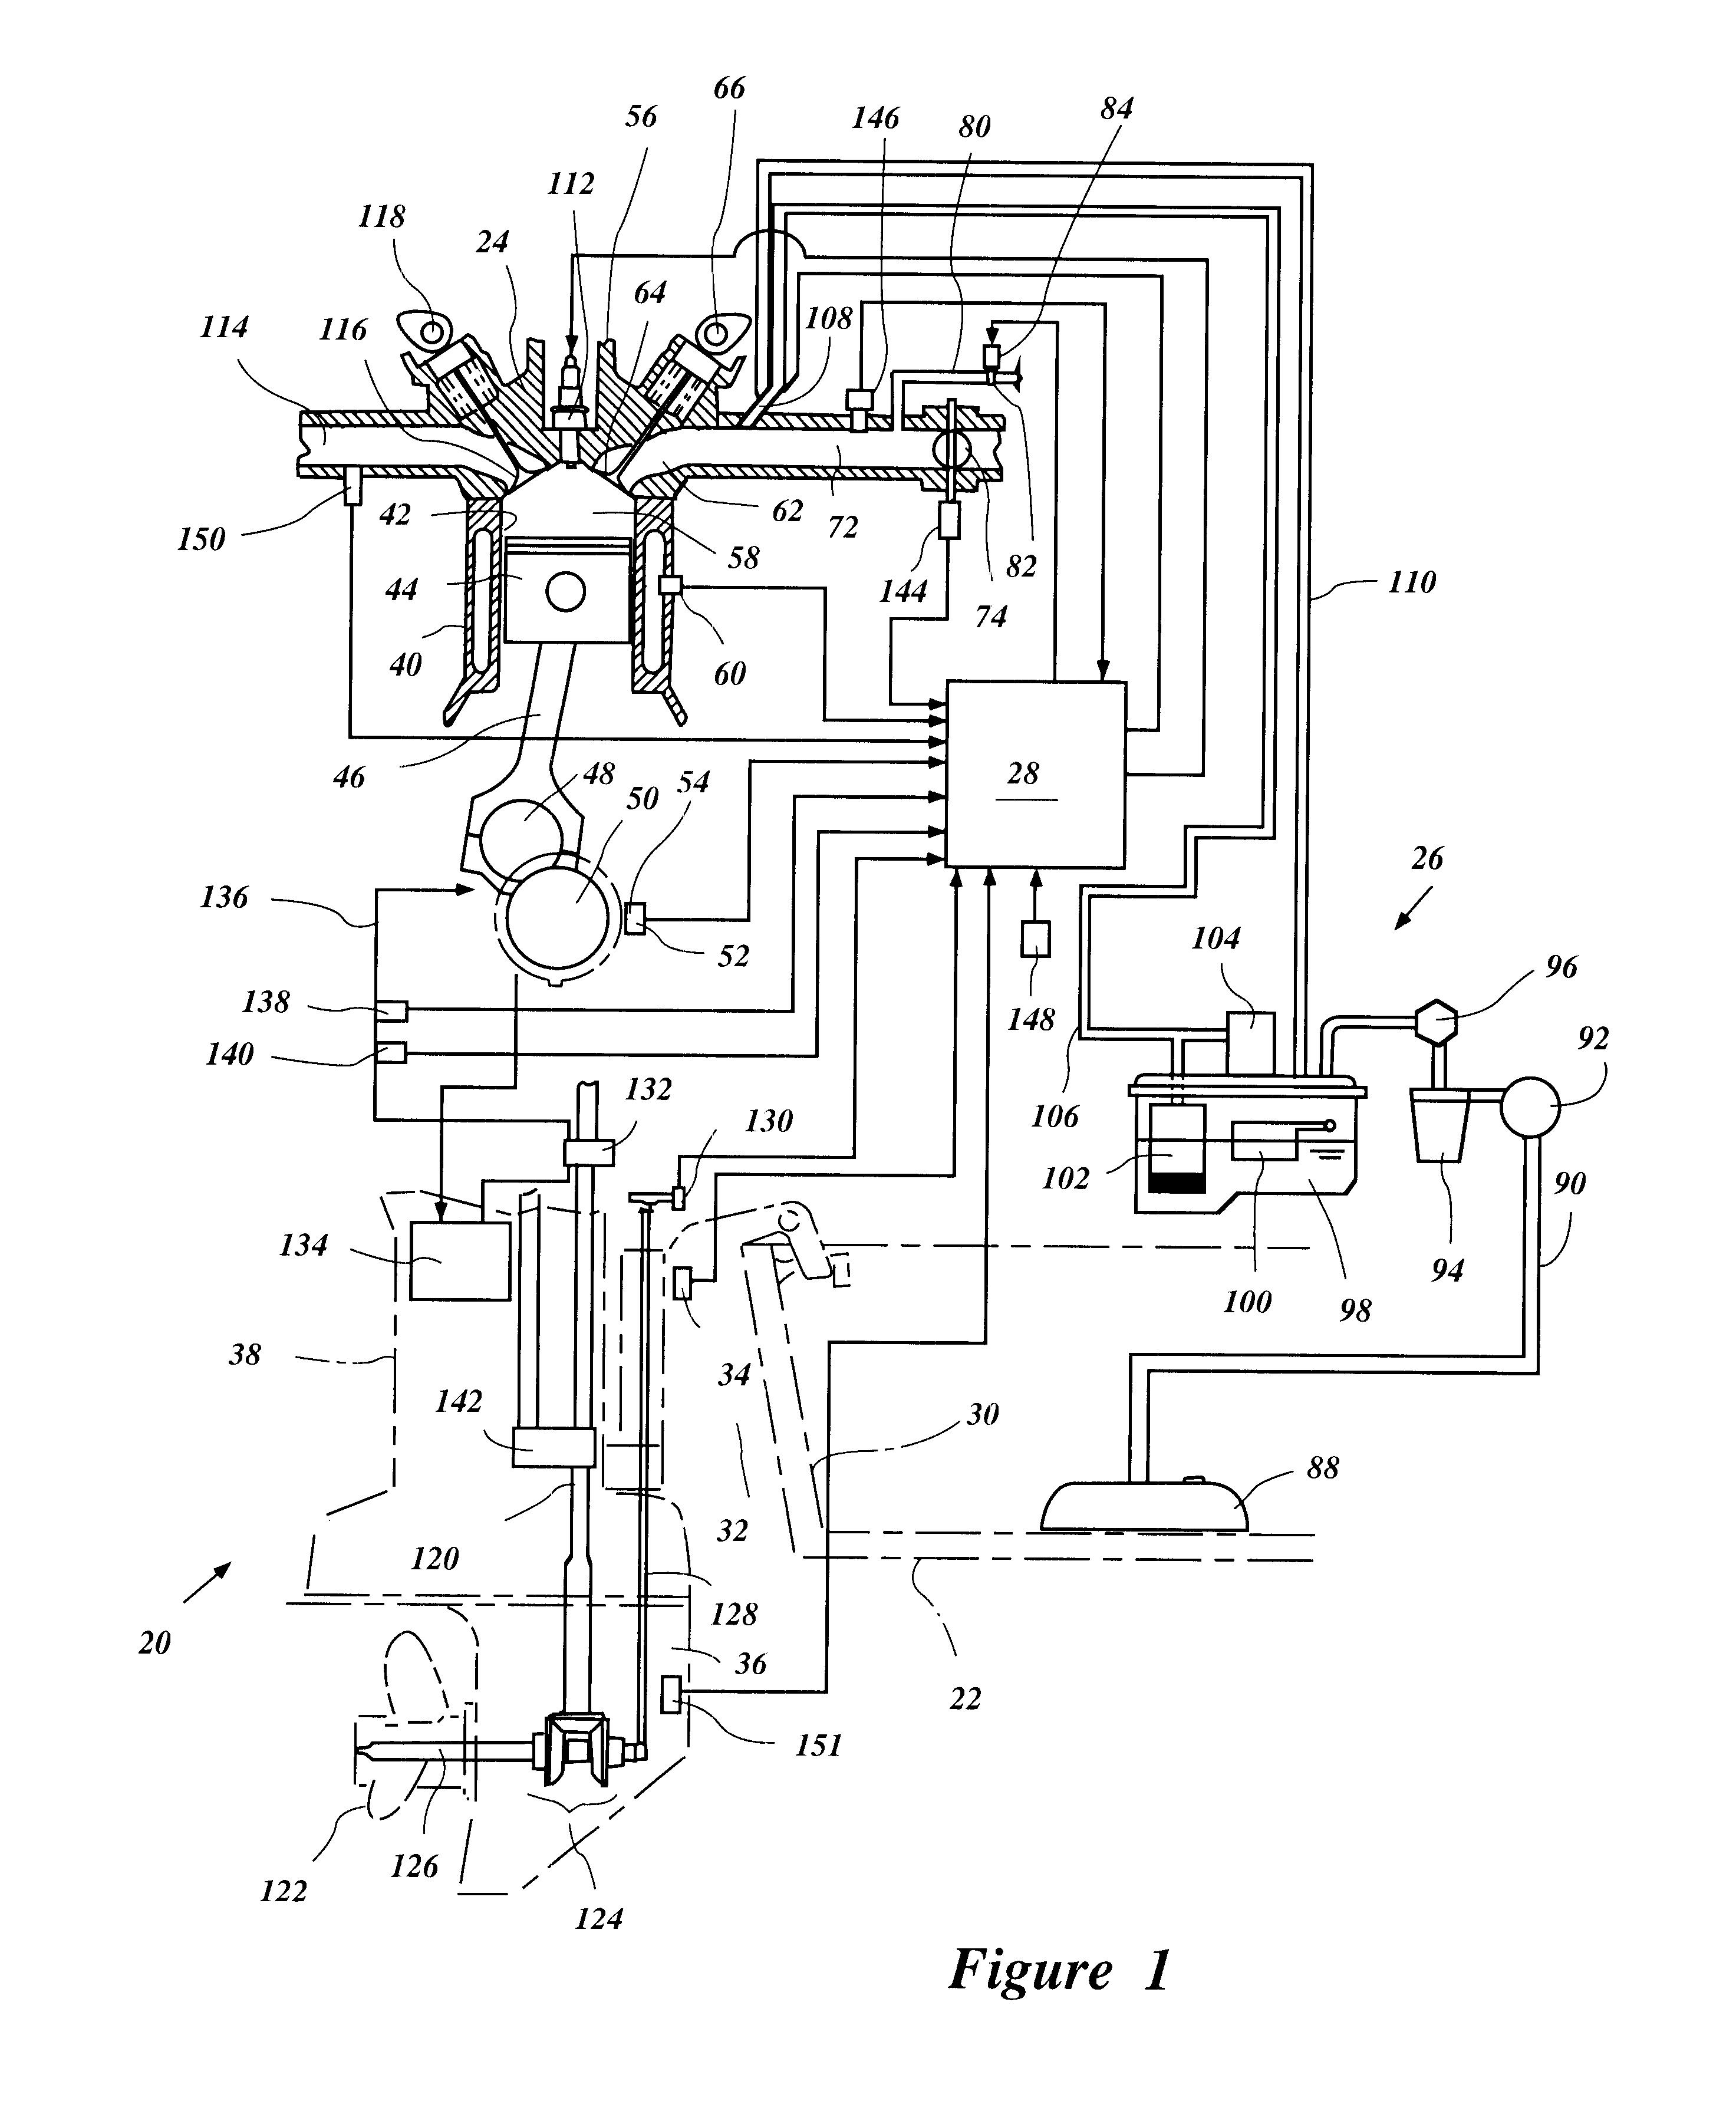 Brevet US6474298 - Idle speed control valve control system